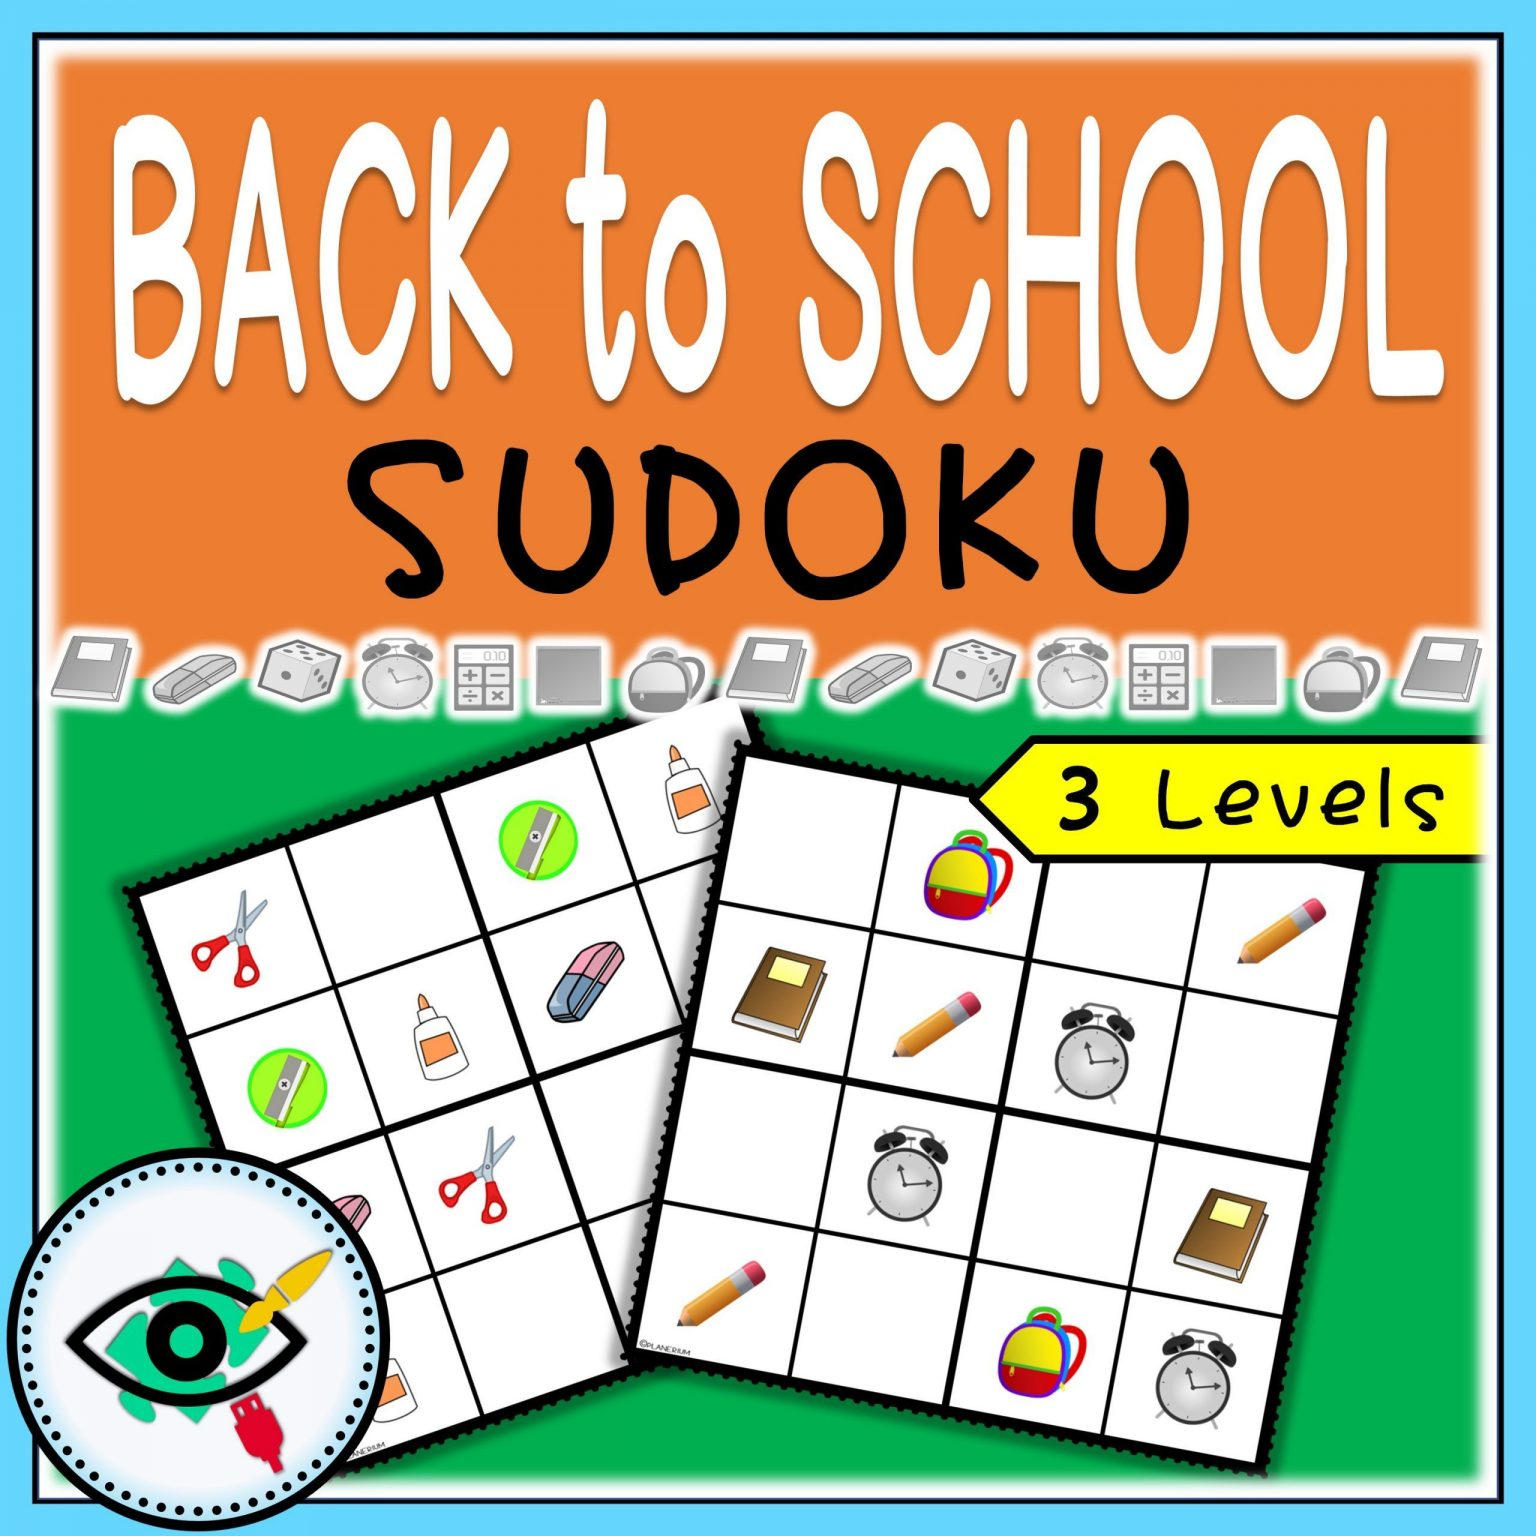 Back to School - Sudoku   Planerium